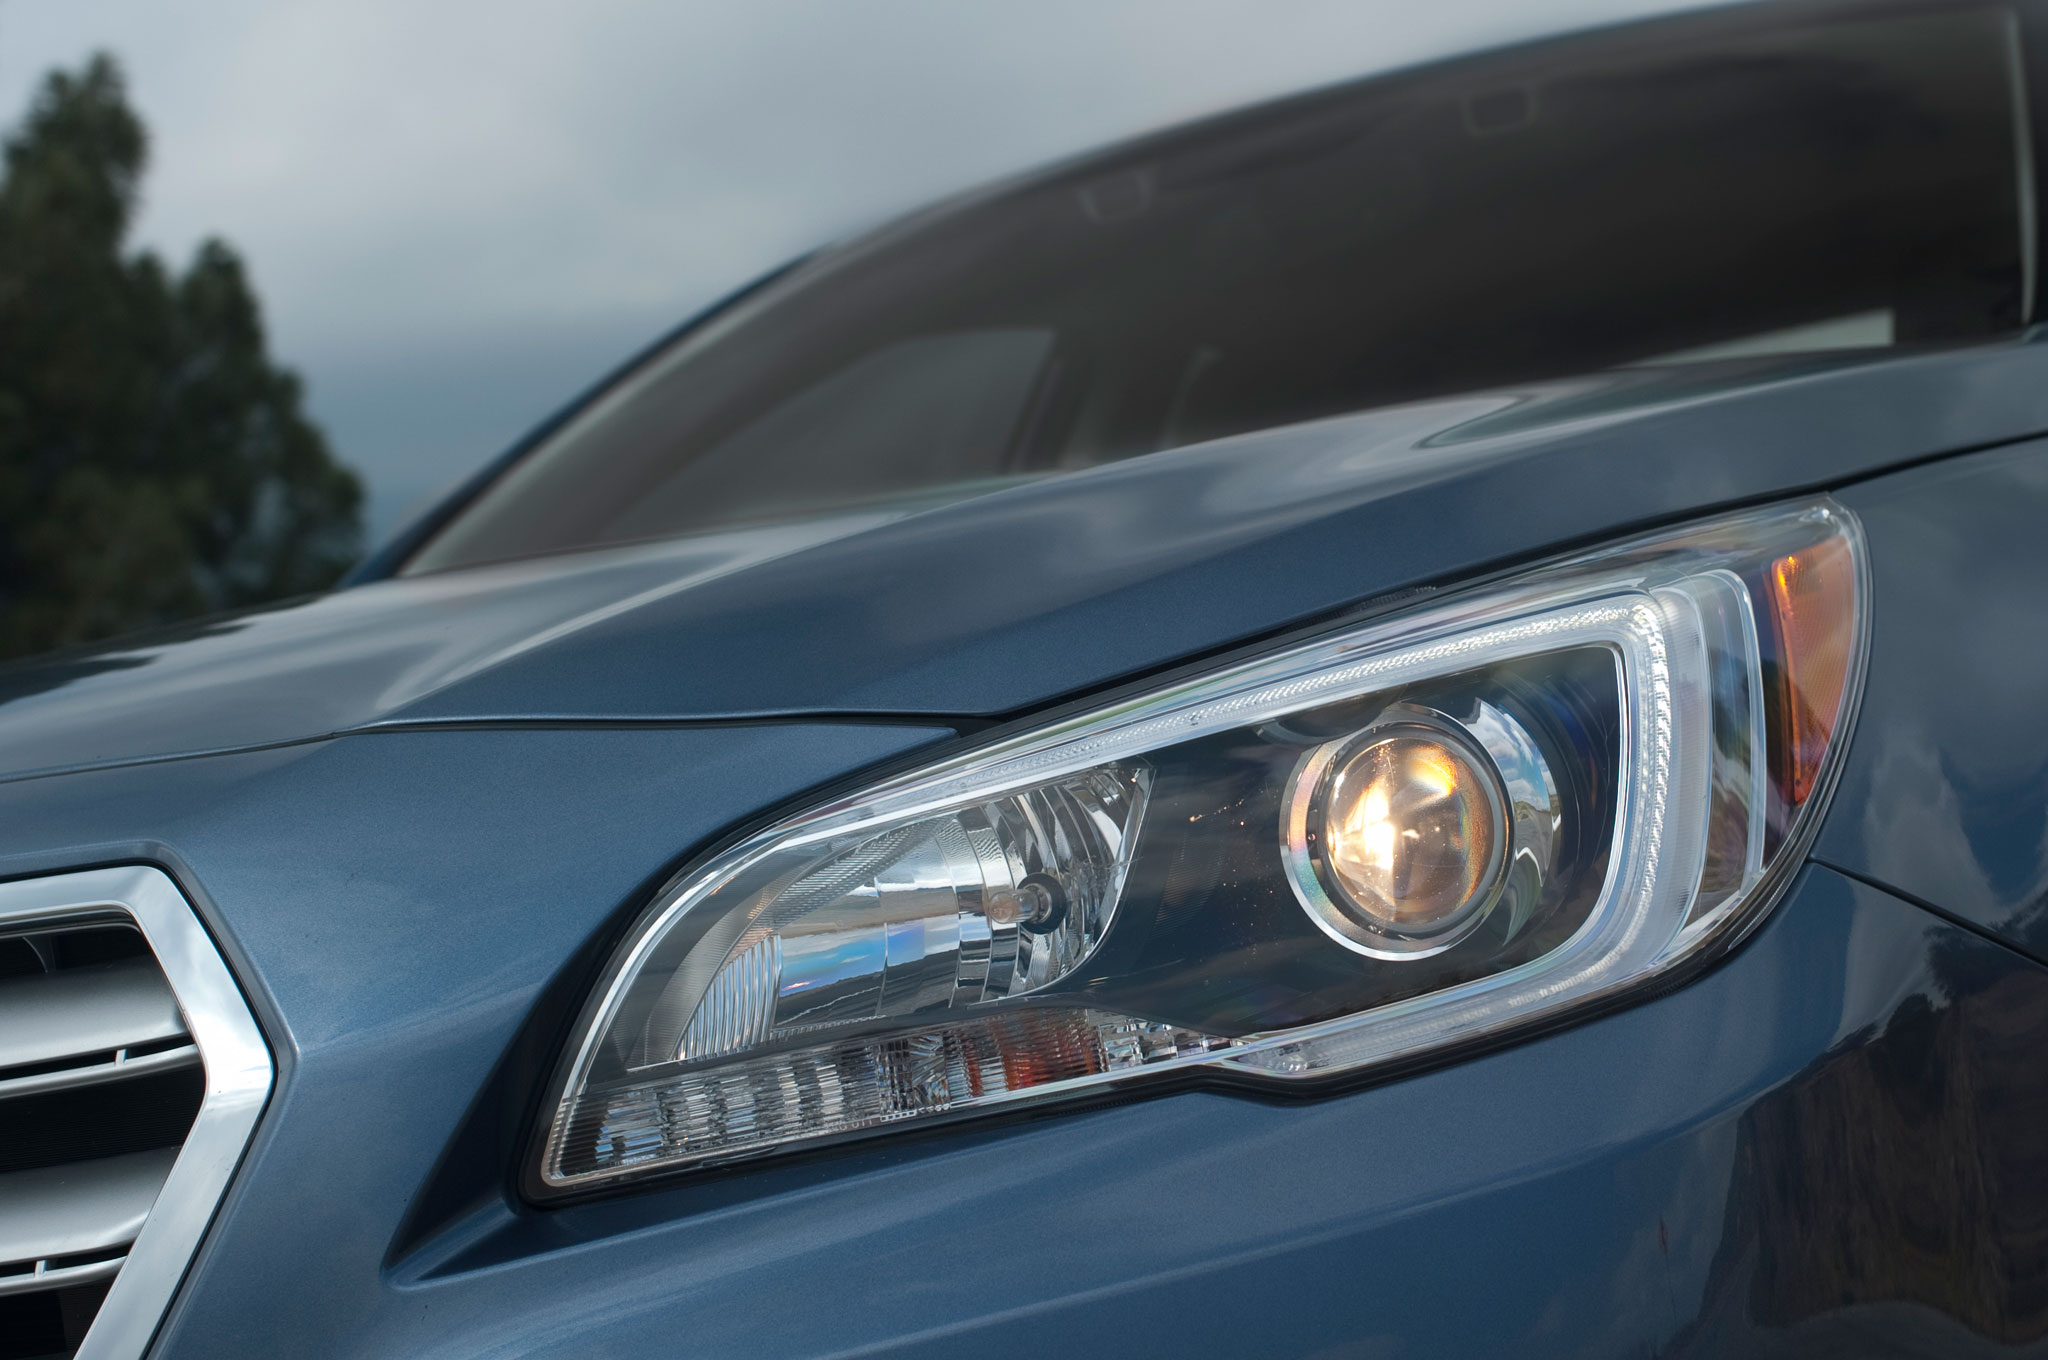 2015 Subaru Legacy 2.5i Limited PZEV Headlamp